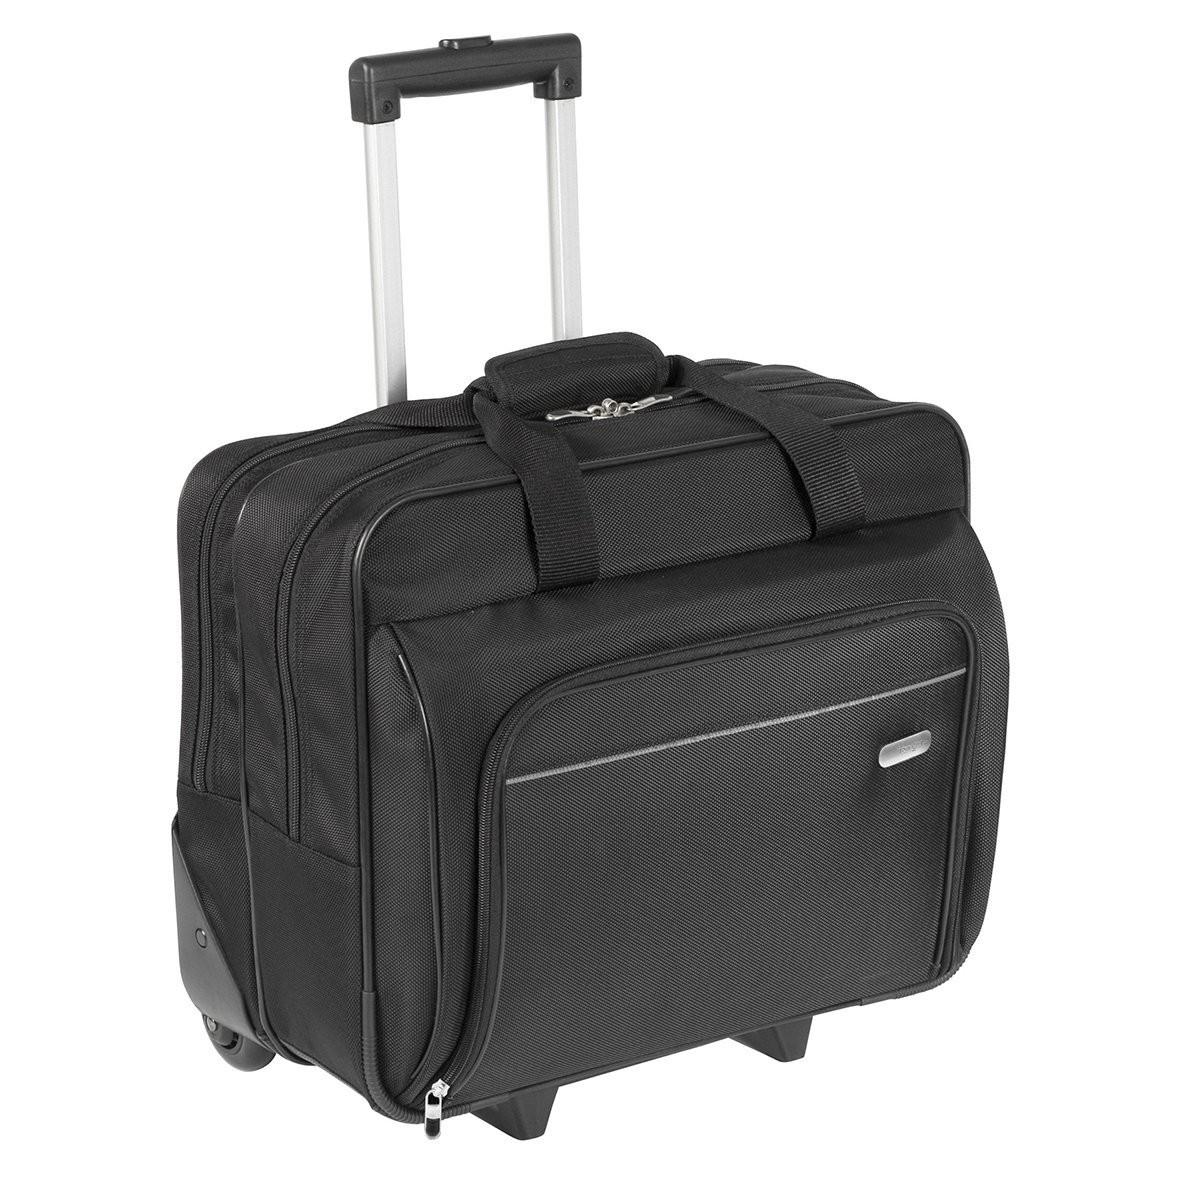 Targus Executive Laptop Roller Bag Black